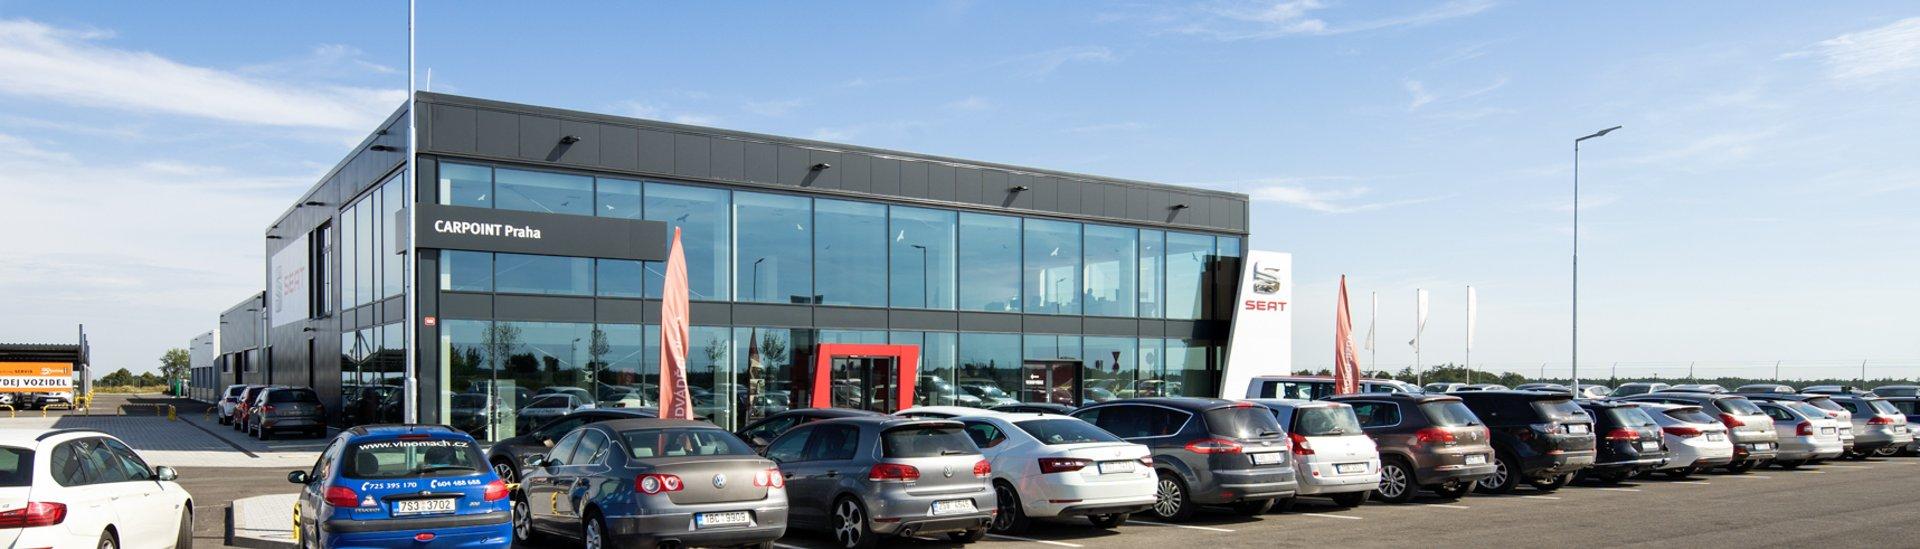 Retail center CZ0657 Car Point